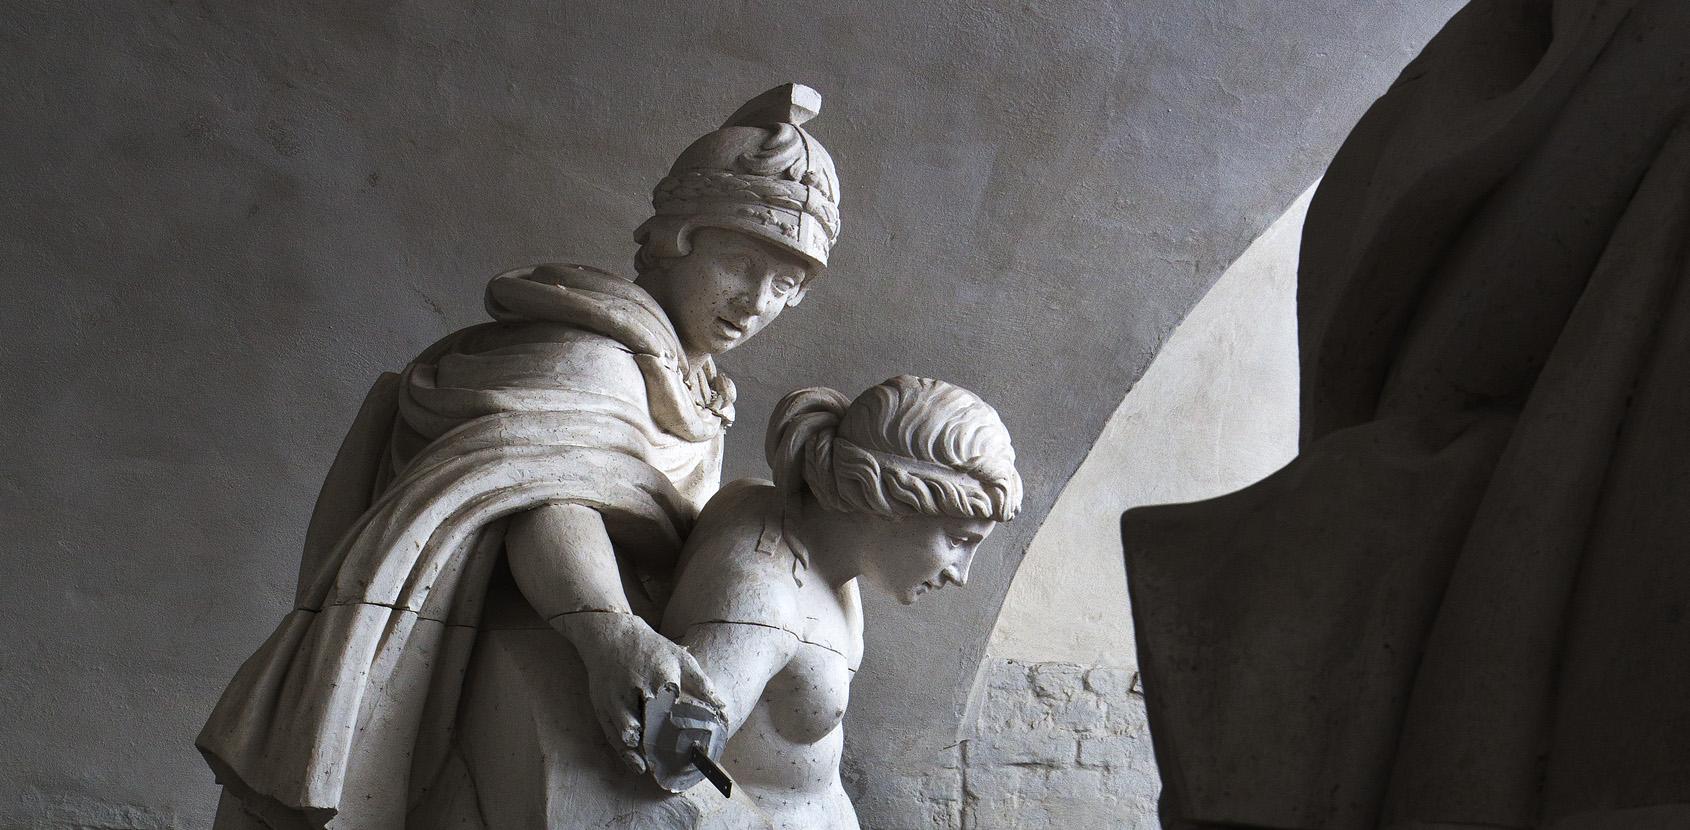 Sculptures in the Lapidarium of Kings photo Thorkild Jensen